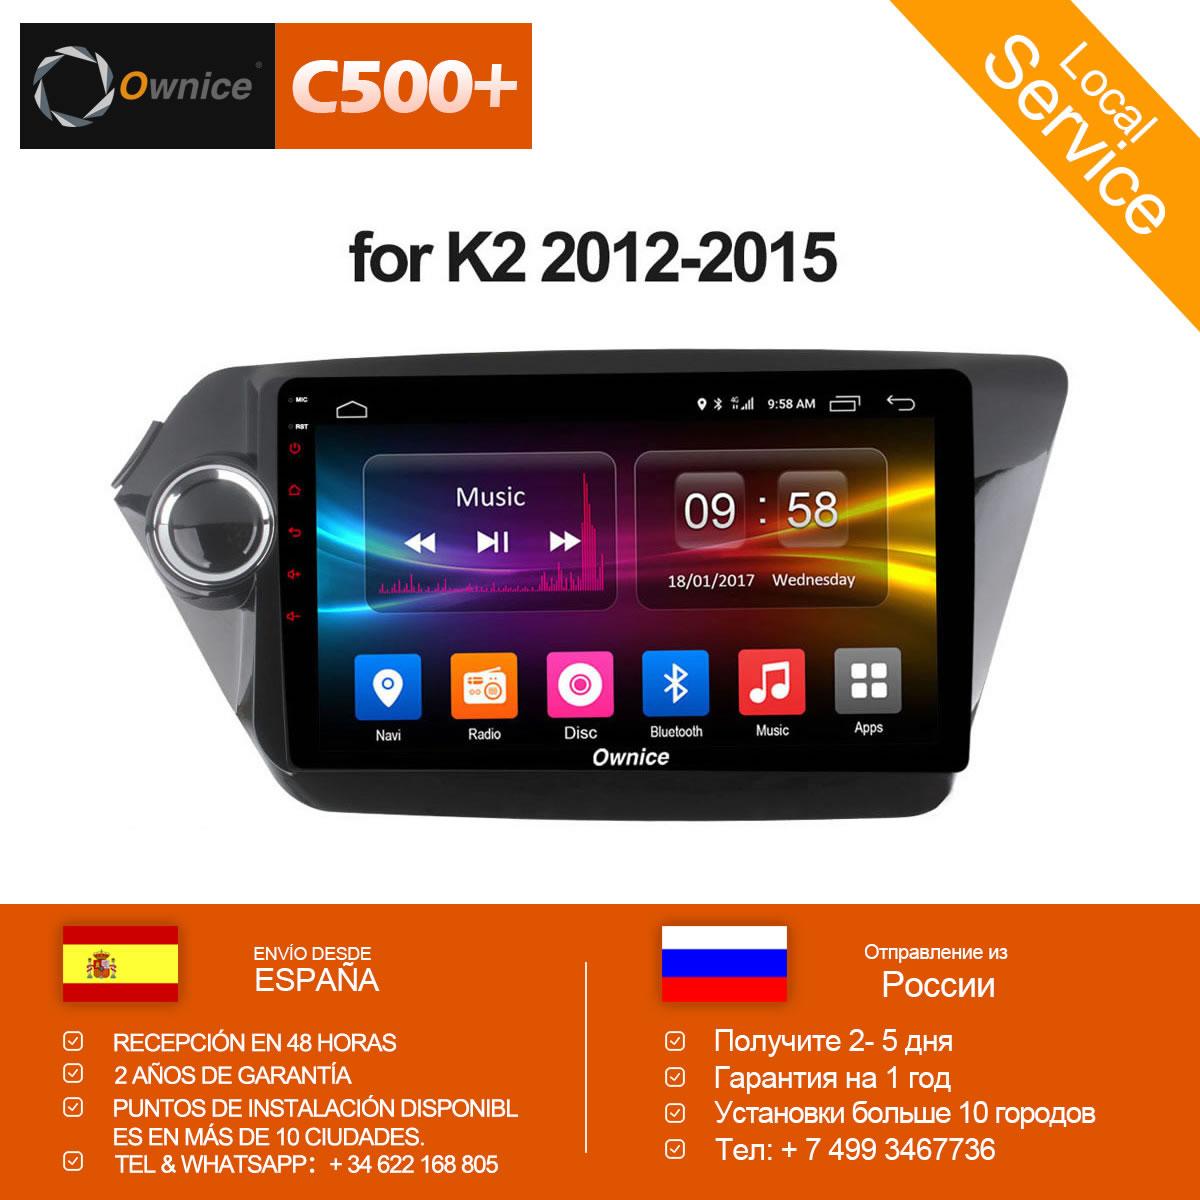 Ownice 8 C500 + G10 Android 8.1 Octa Núcleo jogador rádio do carro GPS navi para Kia k2 RIO 2012 2013 2014 2015g LTE 2017g RAM Apoio 4 2